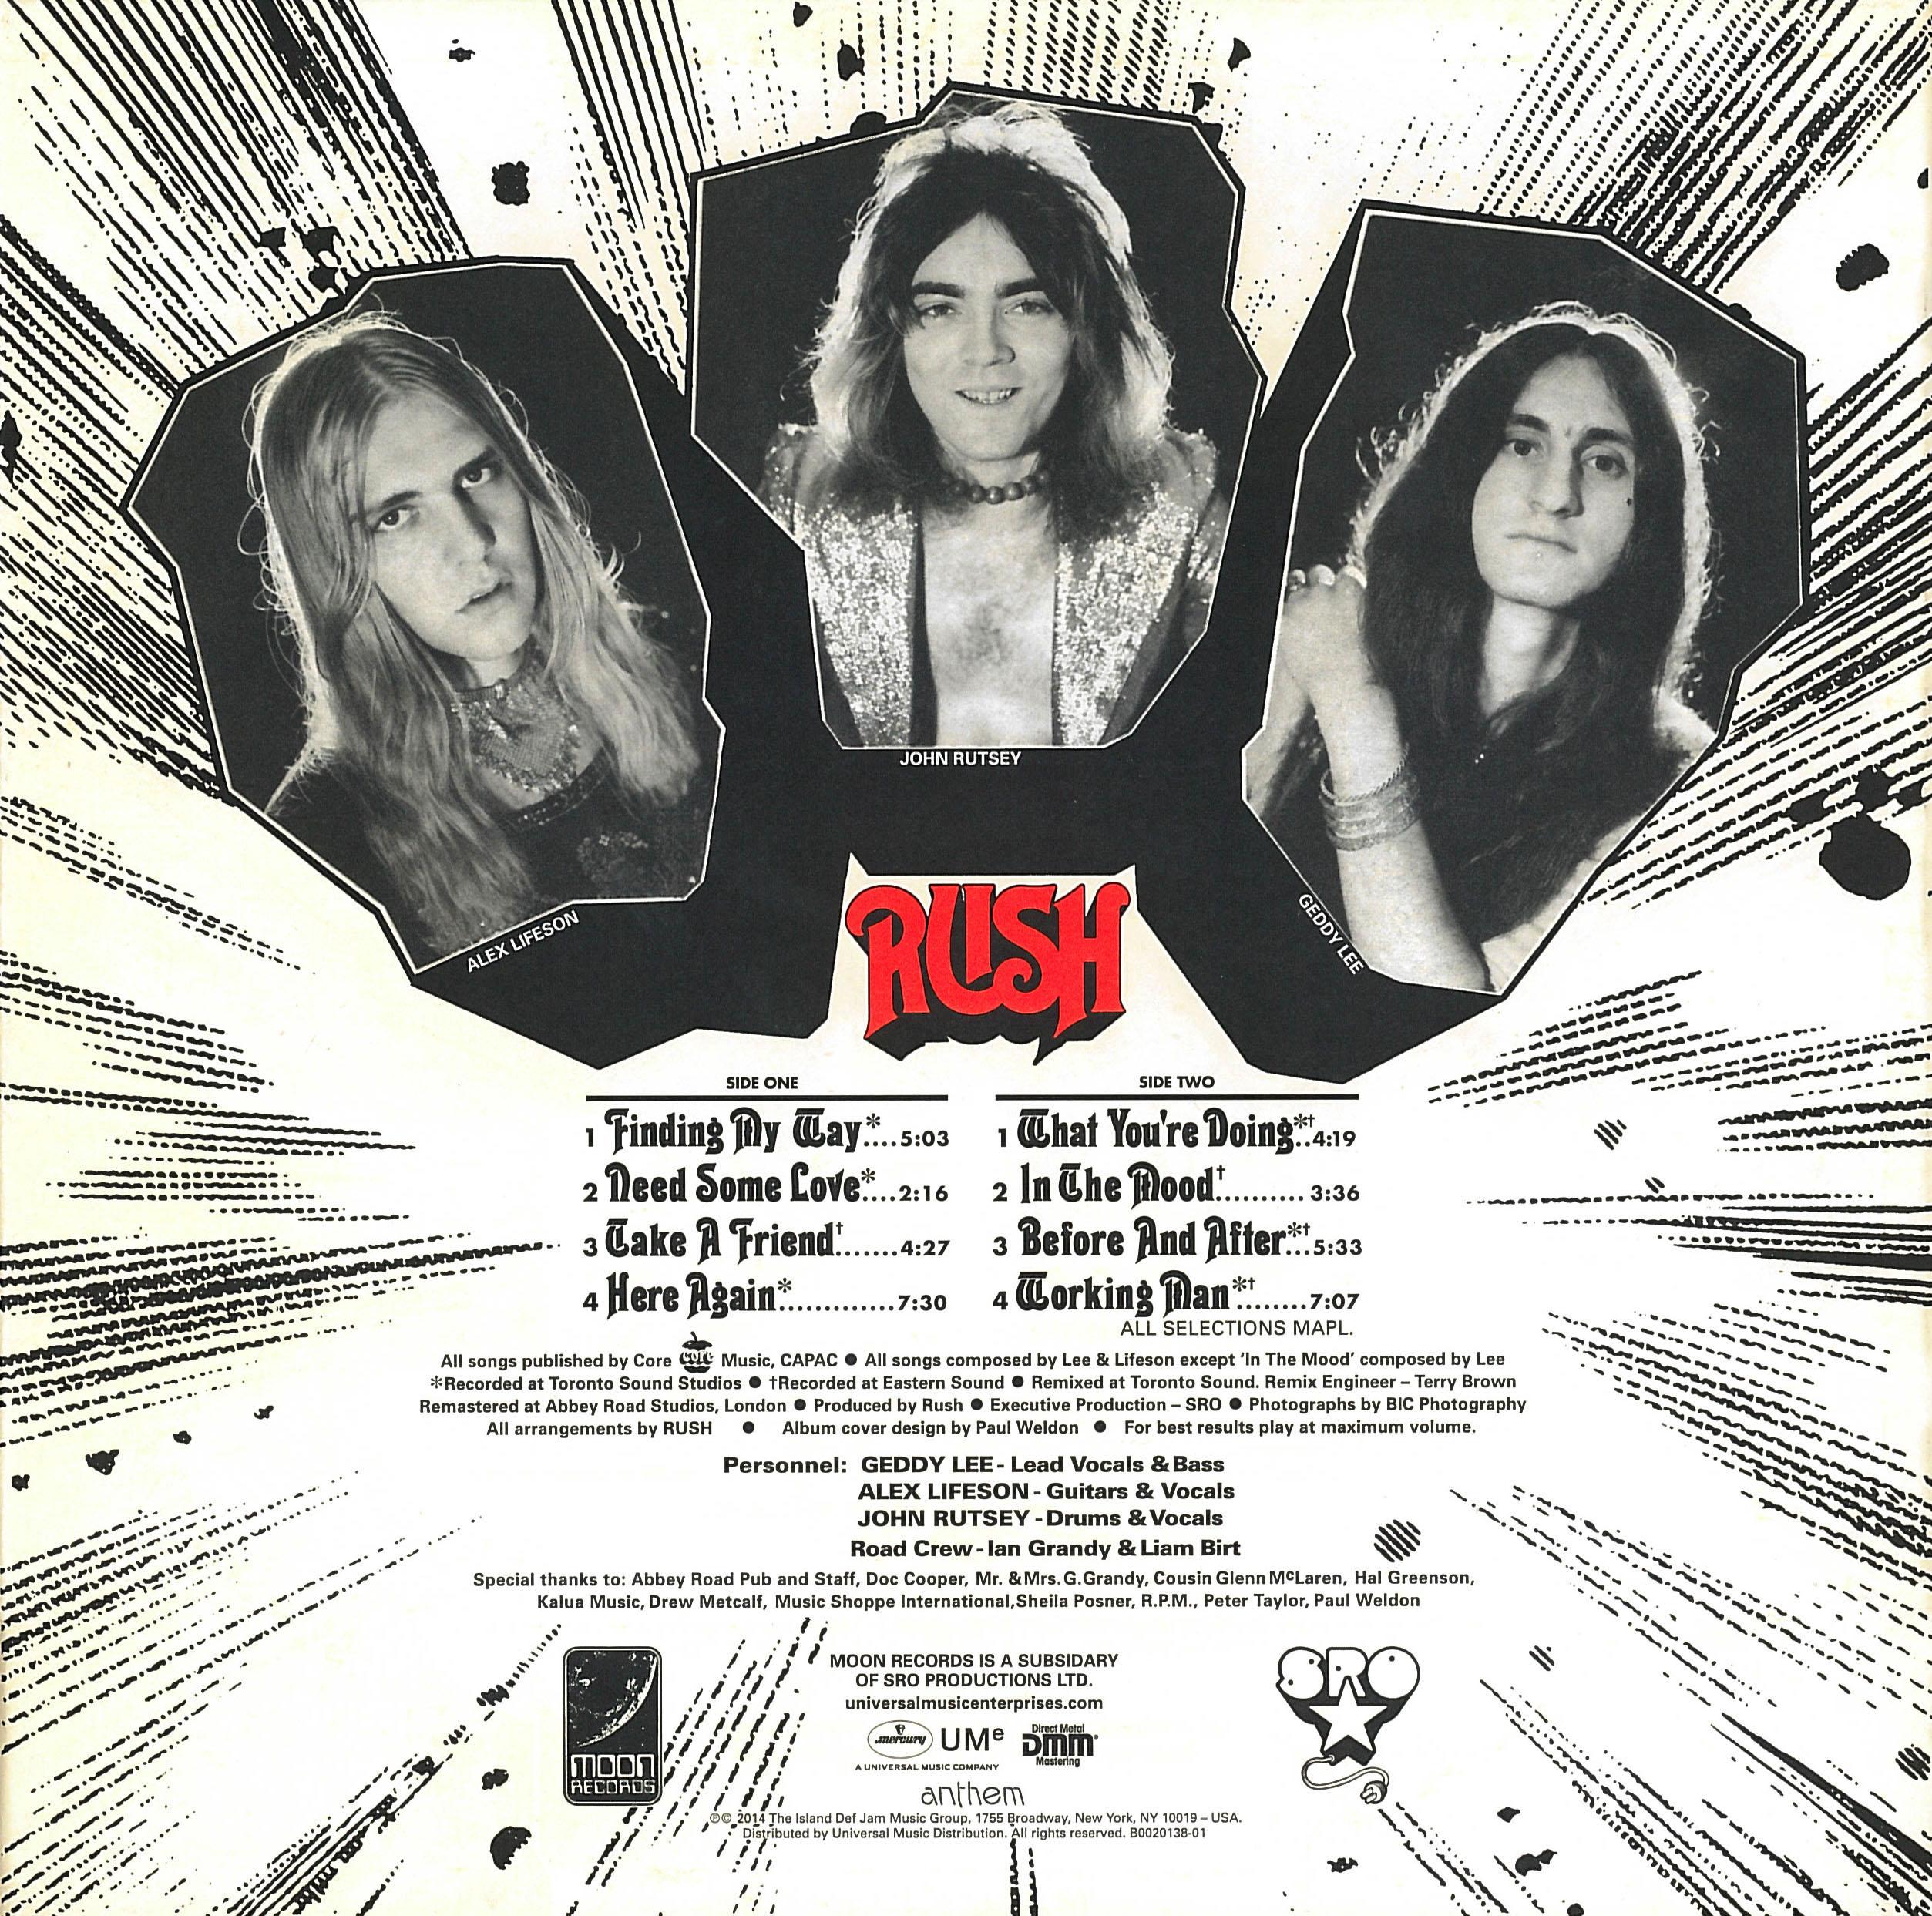 Rush Rediscovered 40th Anniversary Debut Album Reissue